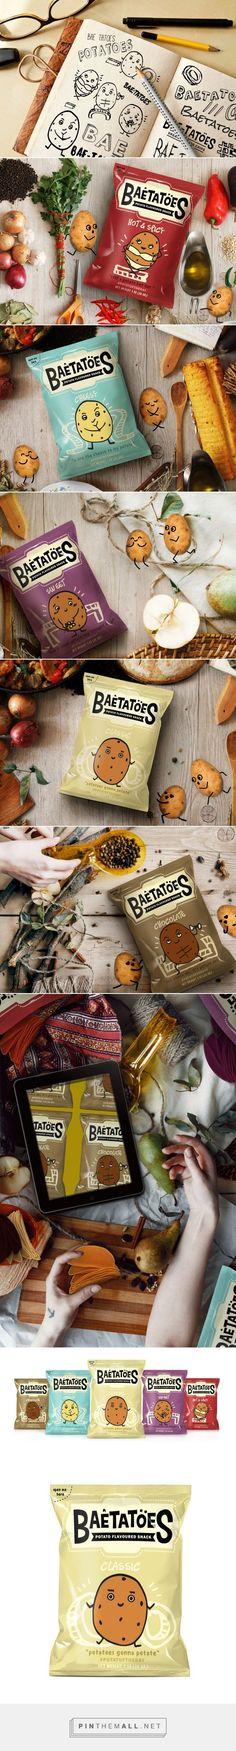 Potato Chips Bag Packaging Design